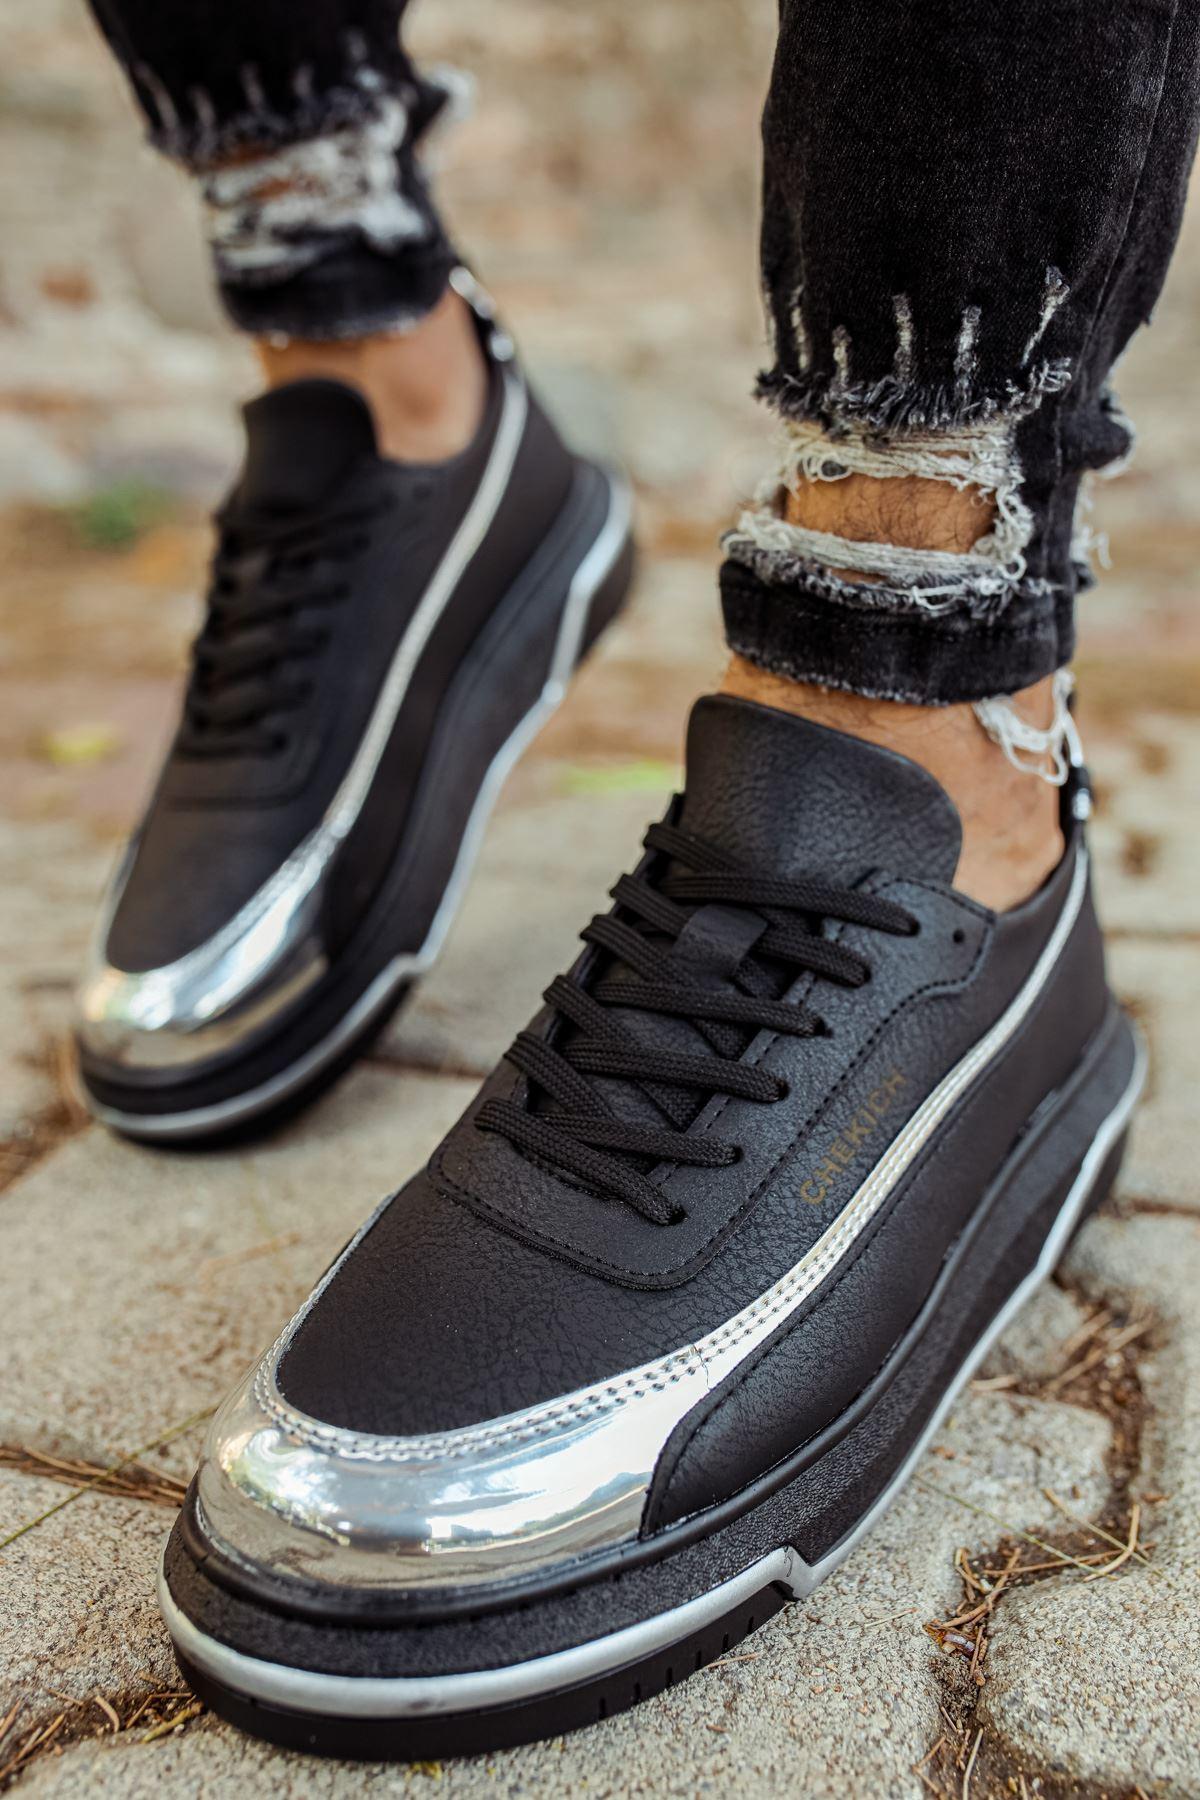 Chekich CH041 ST Erkek Ayakkabı SİYAH / GÜMÜS